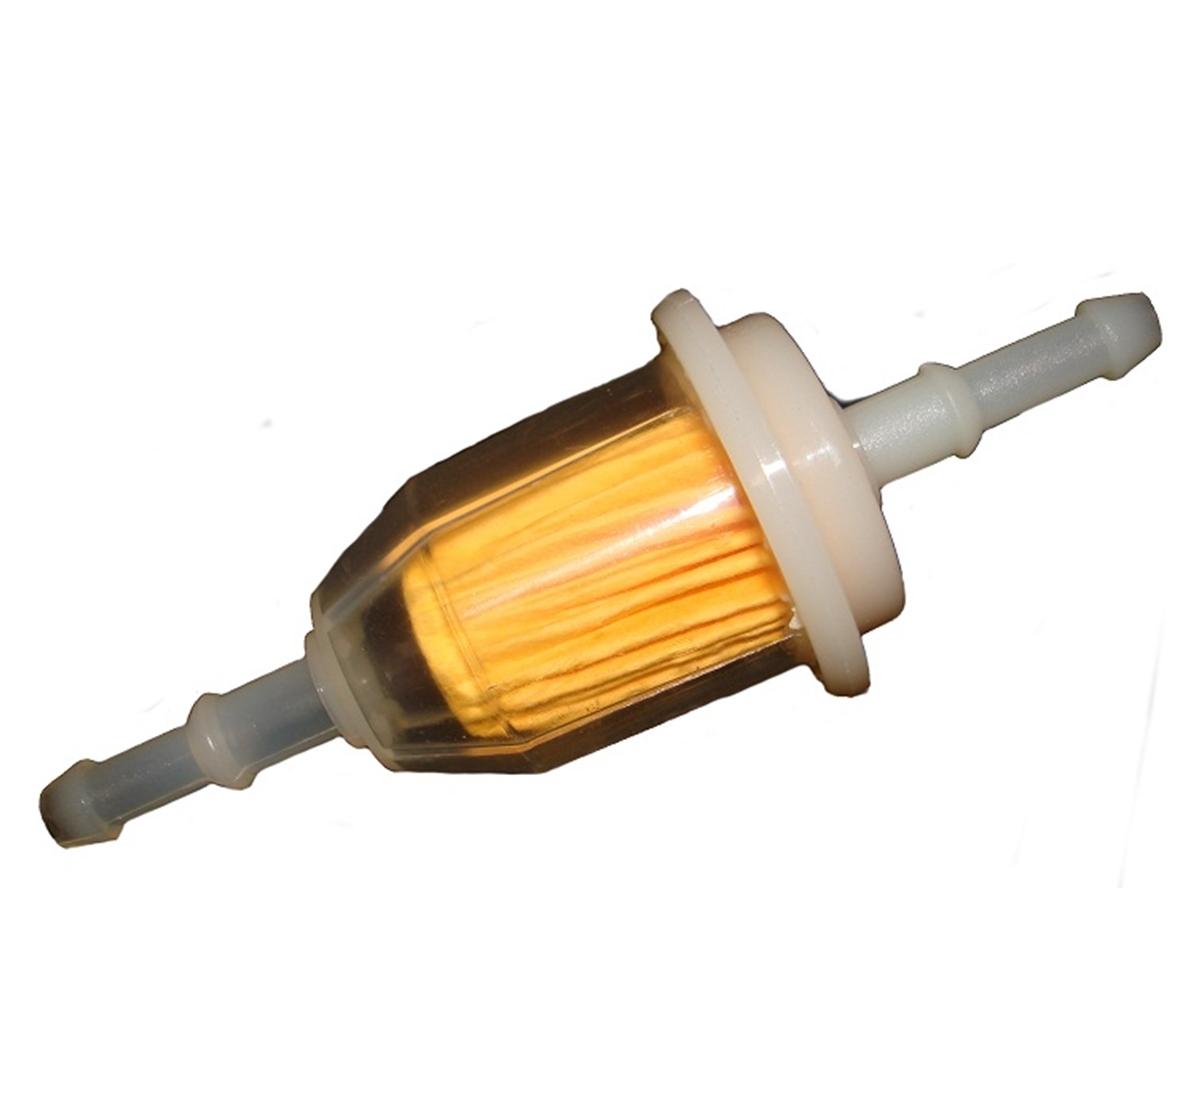 hight resolution of fuel filter for john deere la100 la105 la110 la115 la120